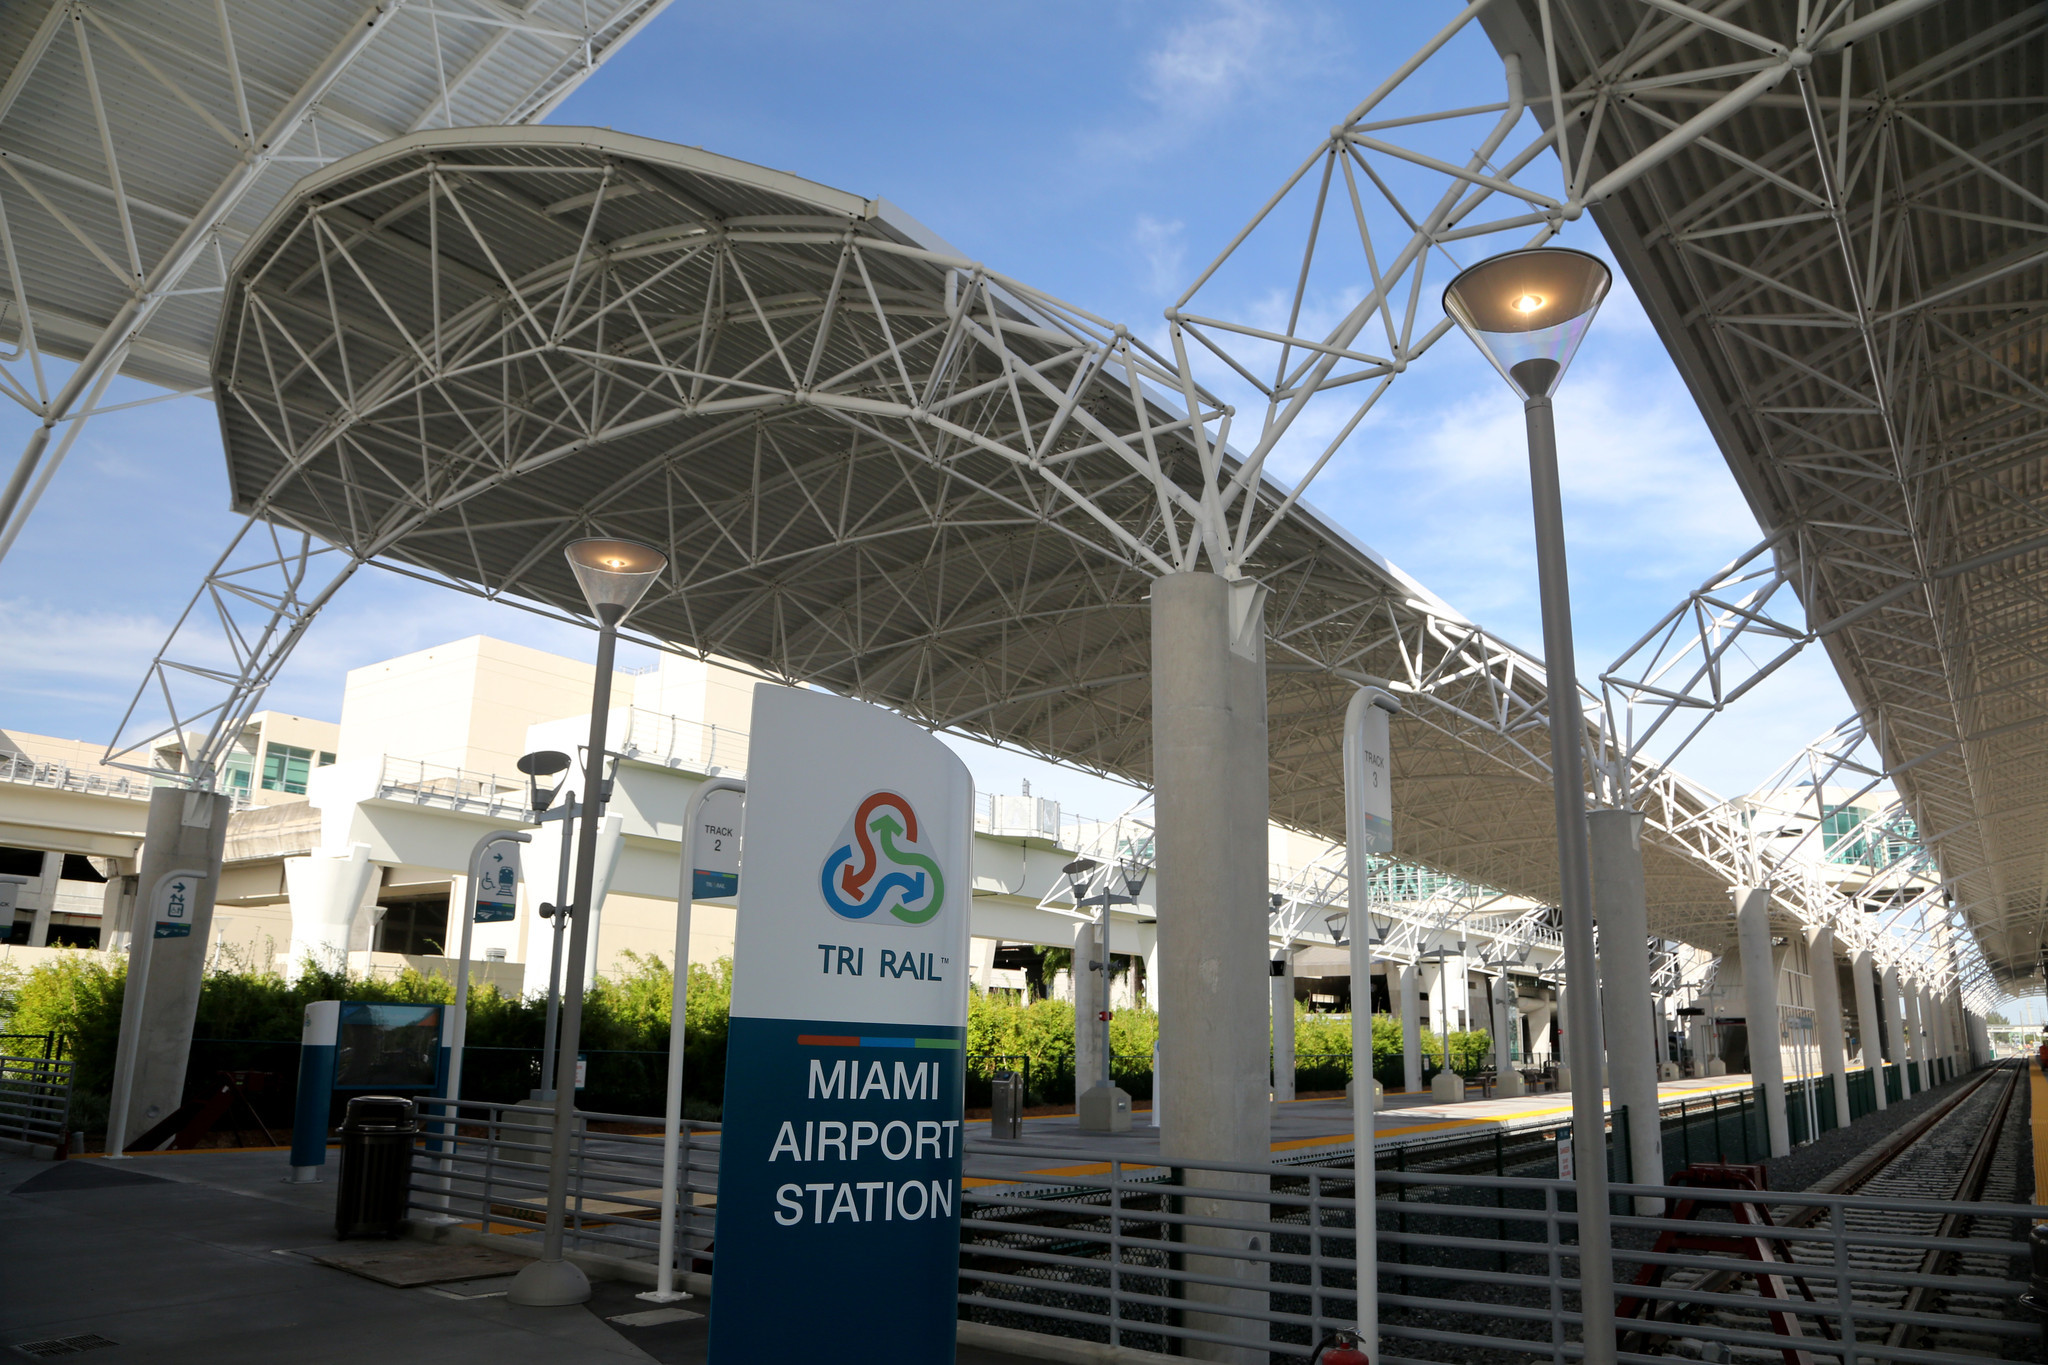 U Save Car Rental Mia Airport